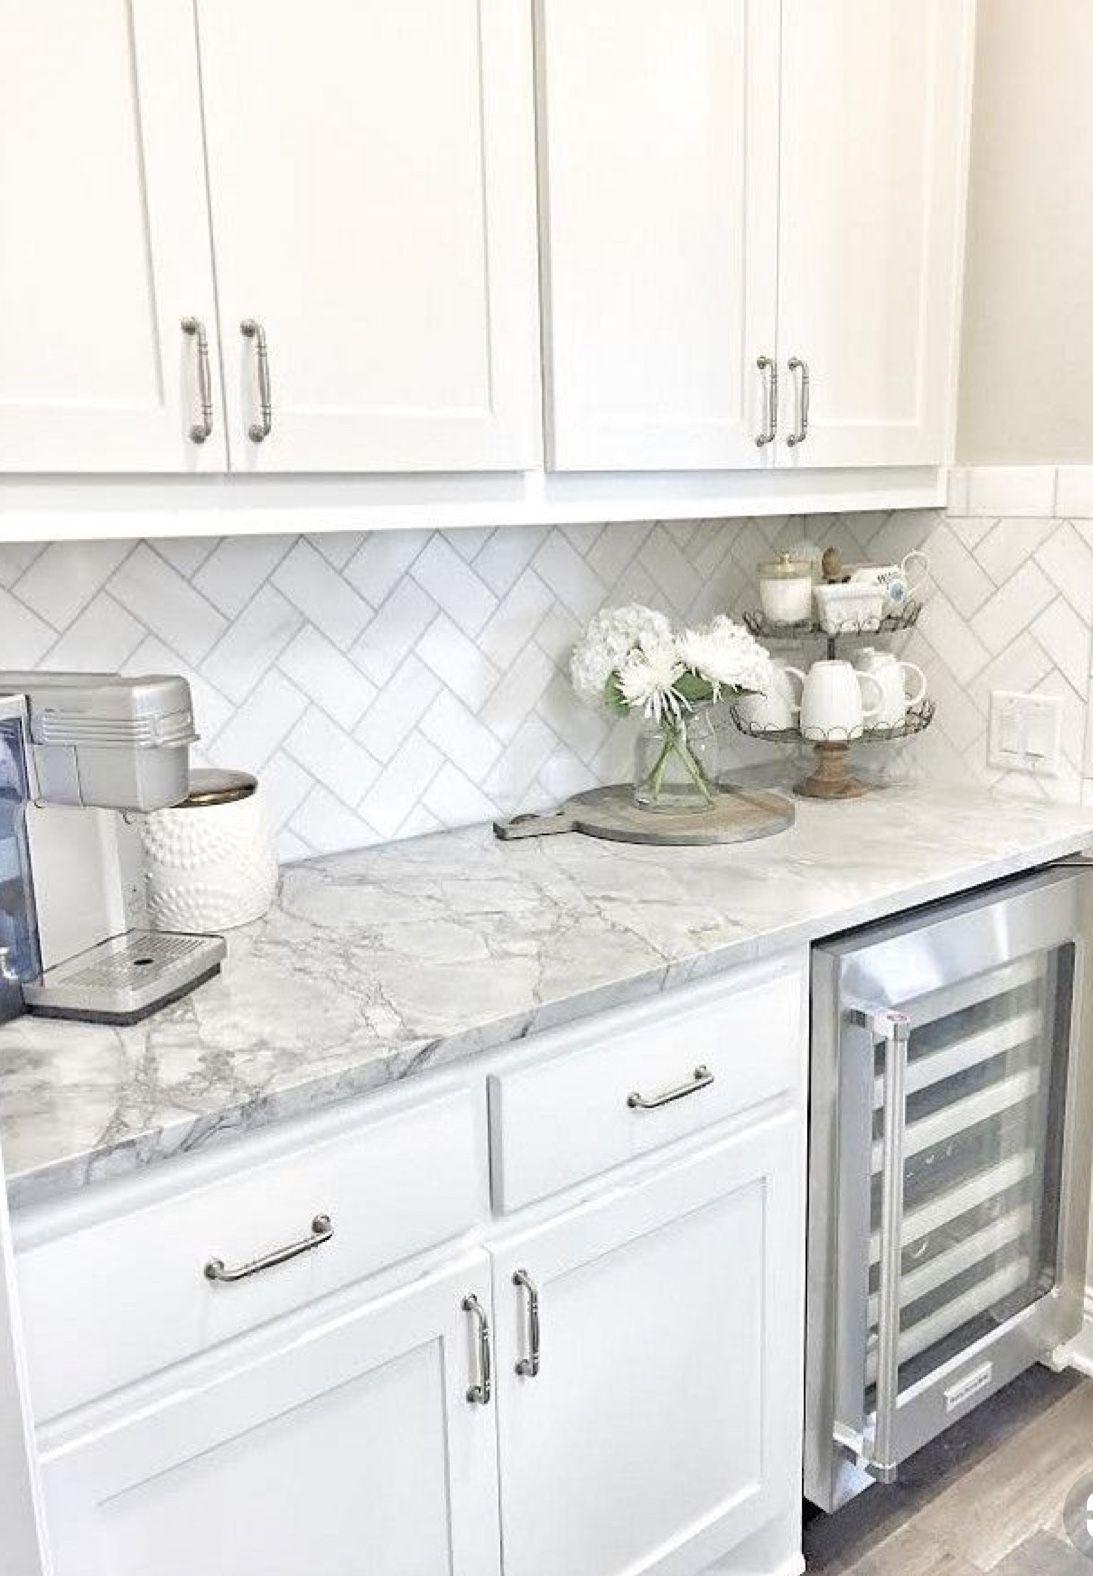 Counter top, backsplash, cabinets. Not hardware | Shabby Chic ...